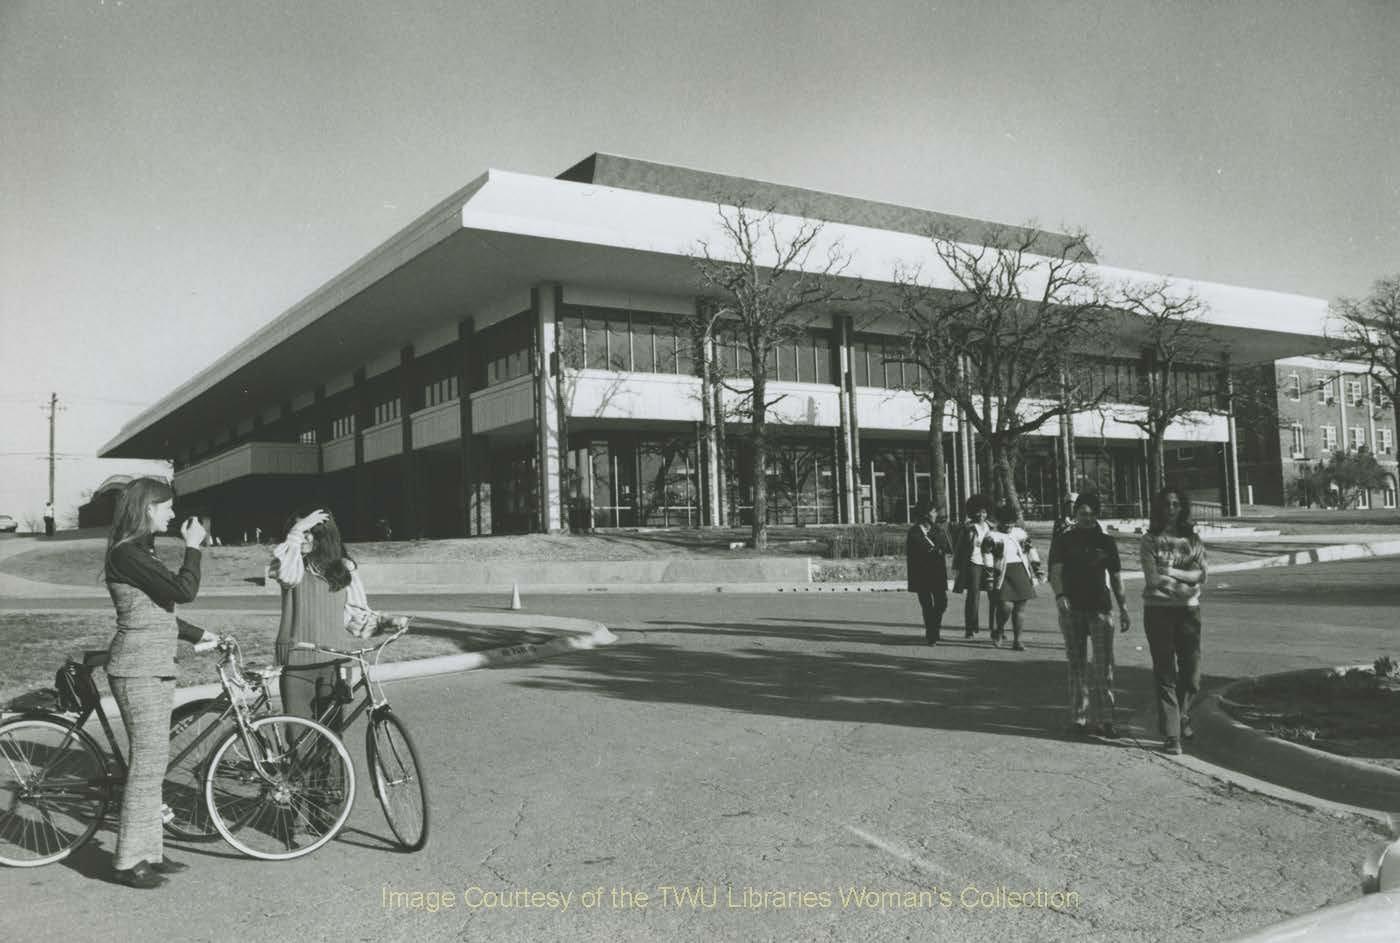 Mary Eleanor Brackenridge Student Union: Picture taken in 1973-1974.